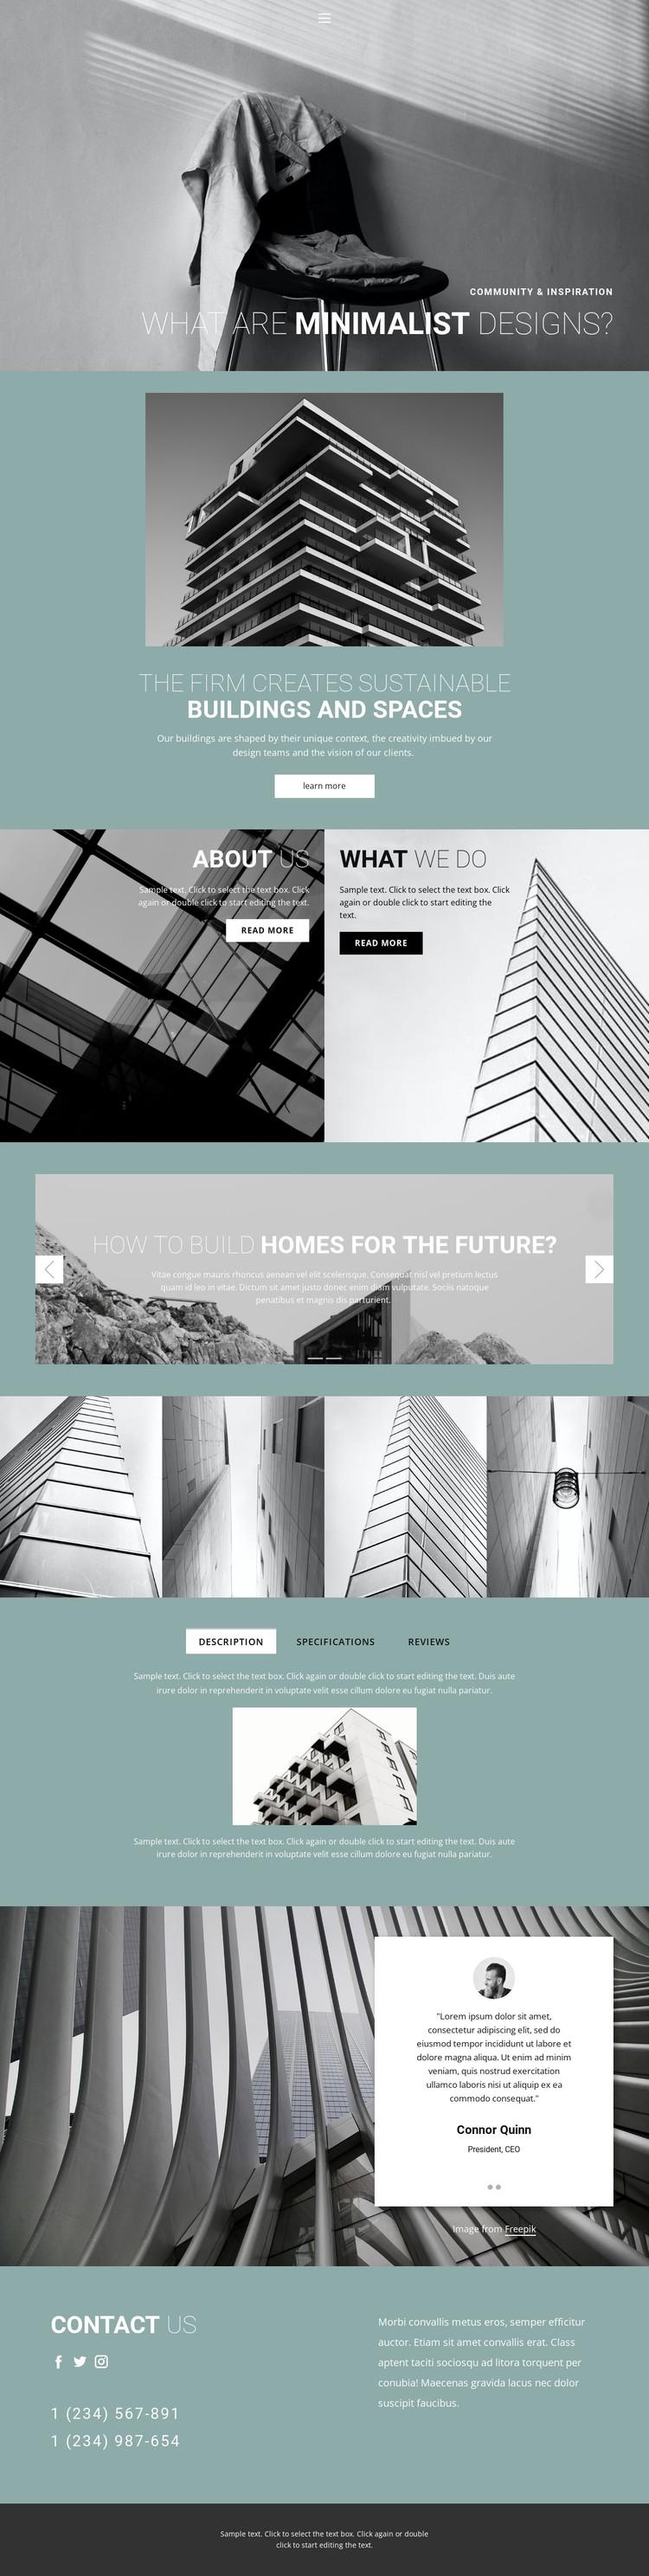 Perfect architecture ideas WordPress Template